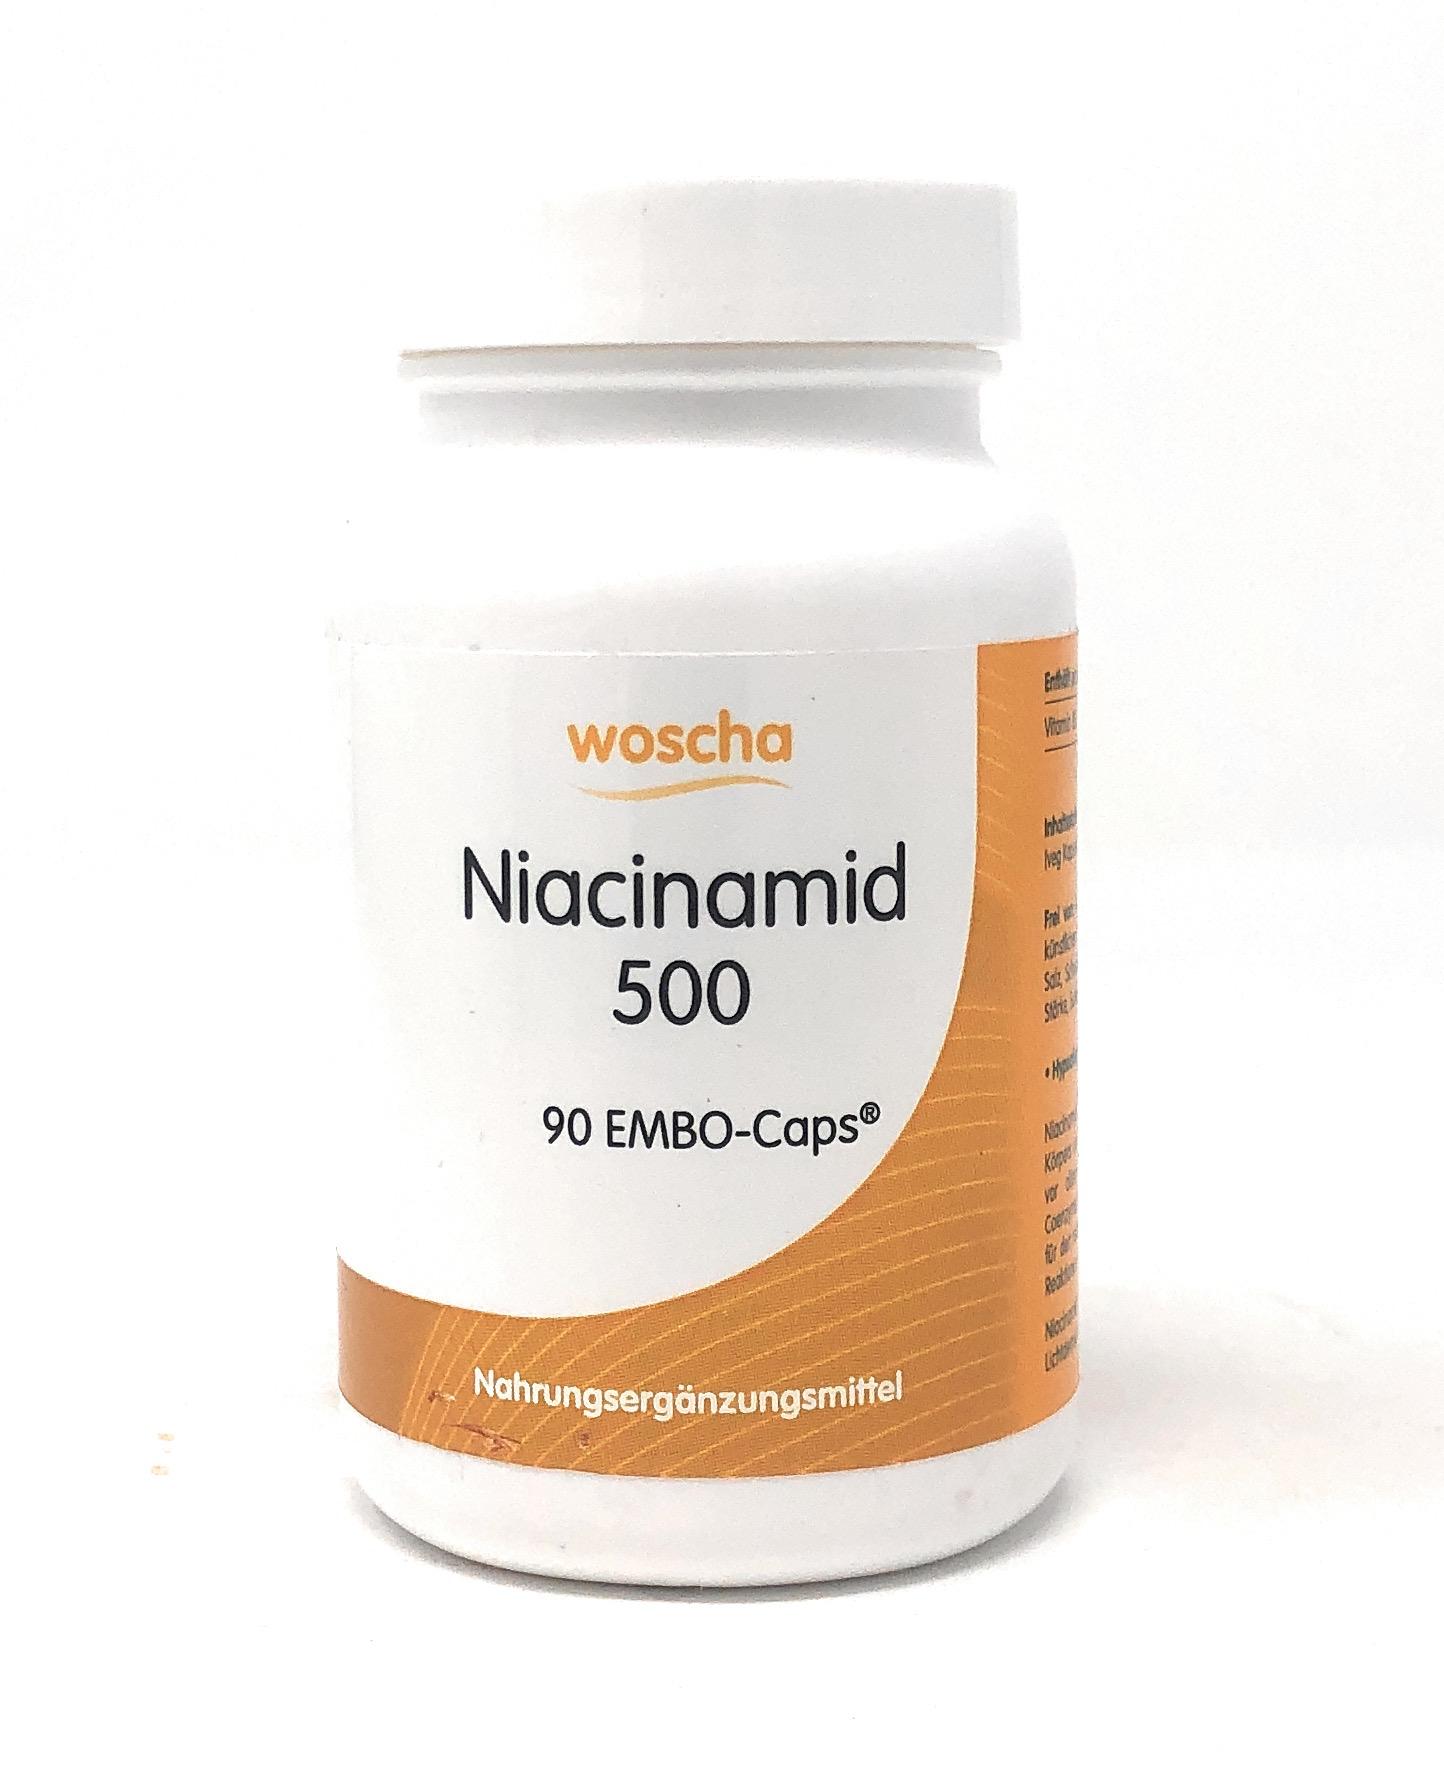 woscha Niacinamid 500 90 Embo-Caps (vegan)(53g)